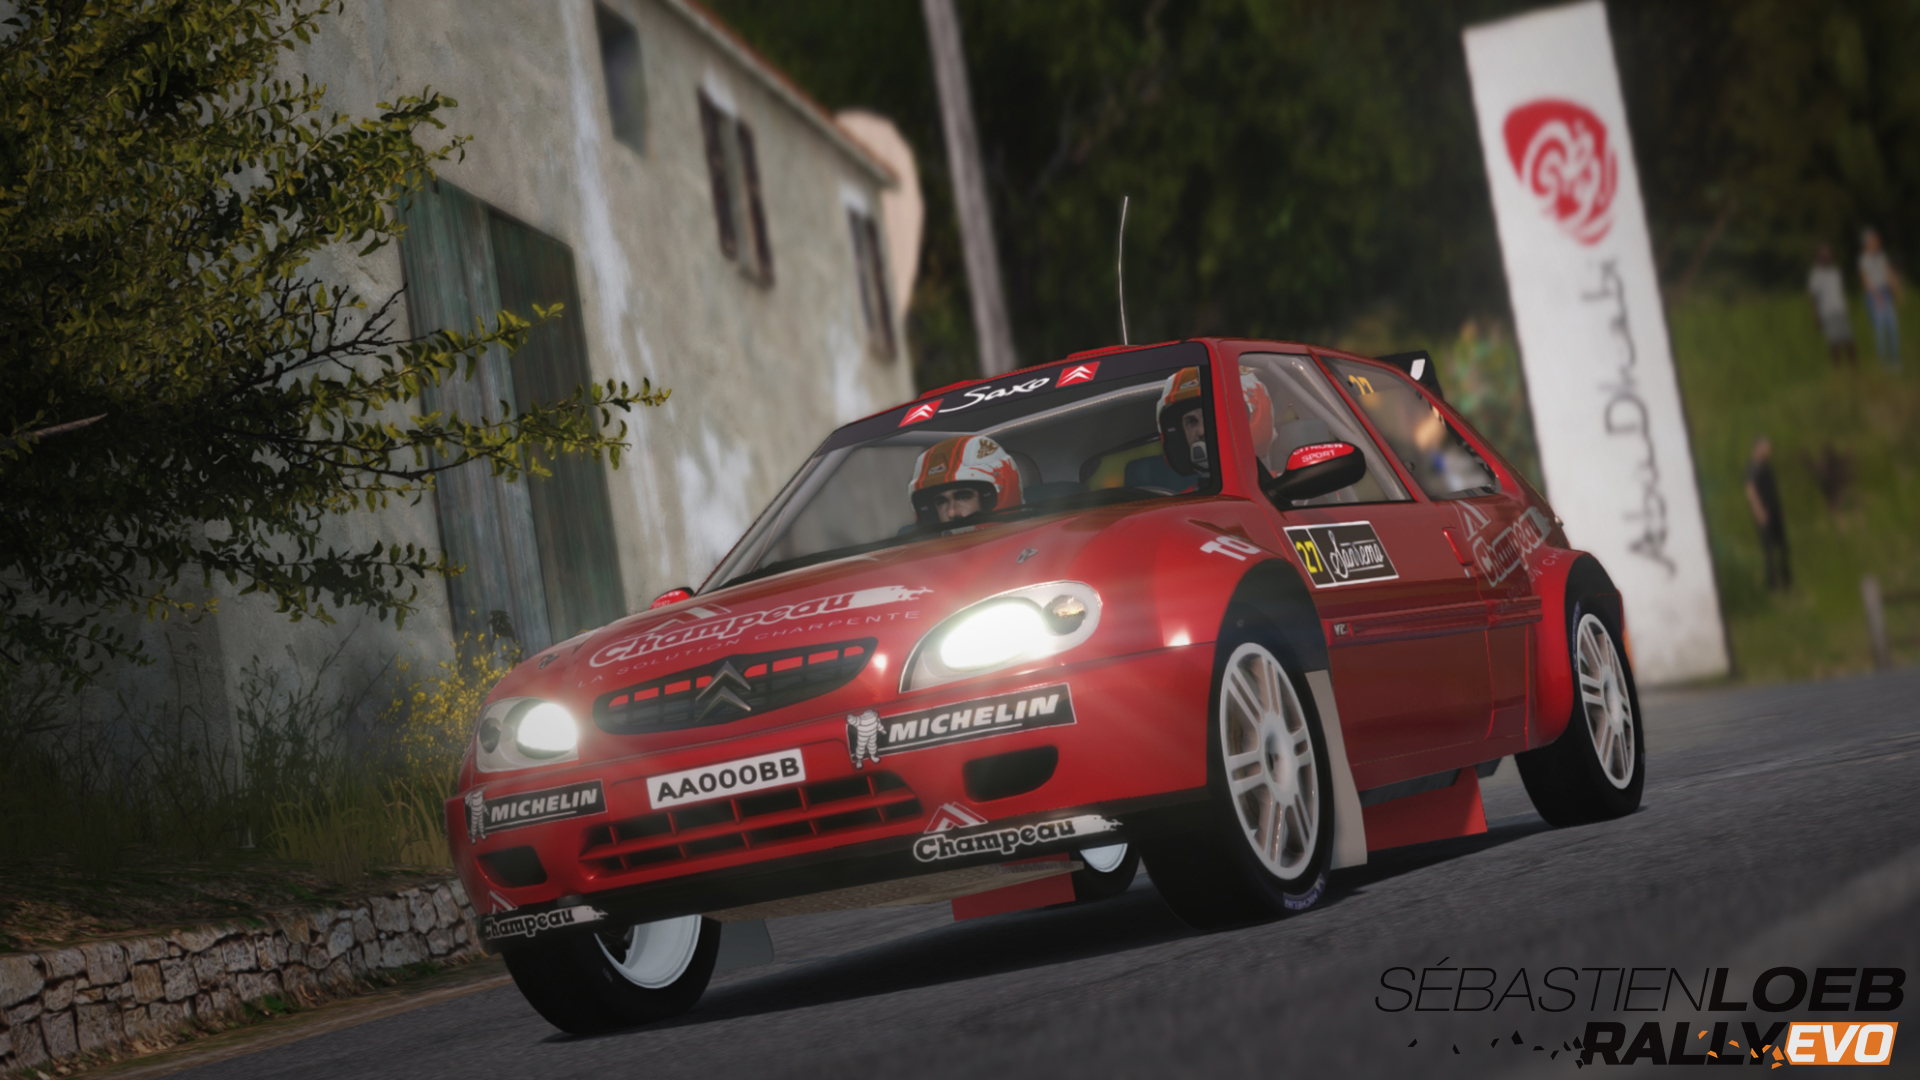 Sebastien Loeb Rally EVO (Milestone S.r.l.) (ENG|MULTI7) [L]